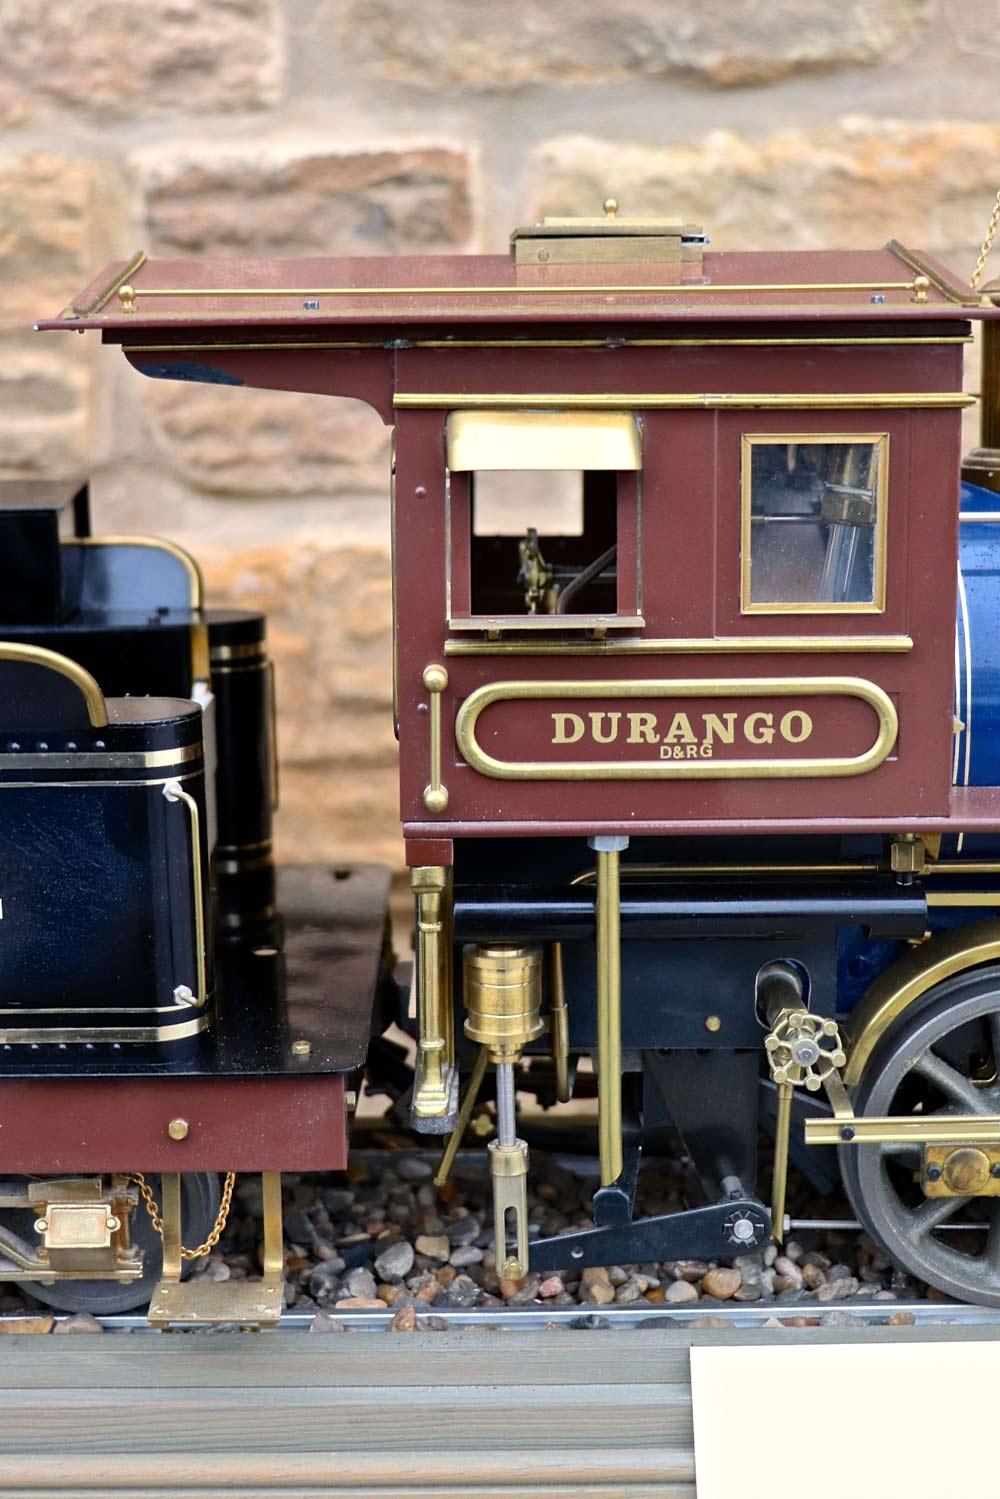 test 3-and-a-half-OS-live-steam-porter-2-6-0-locomotive-for-sale-12